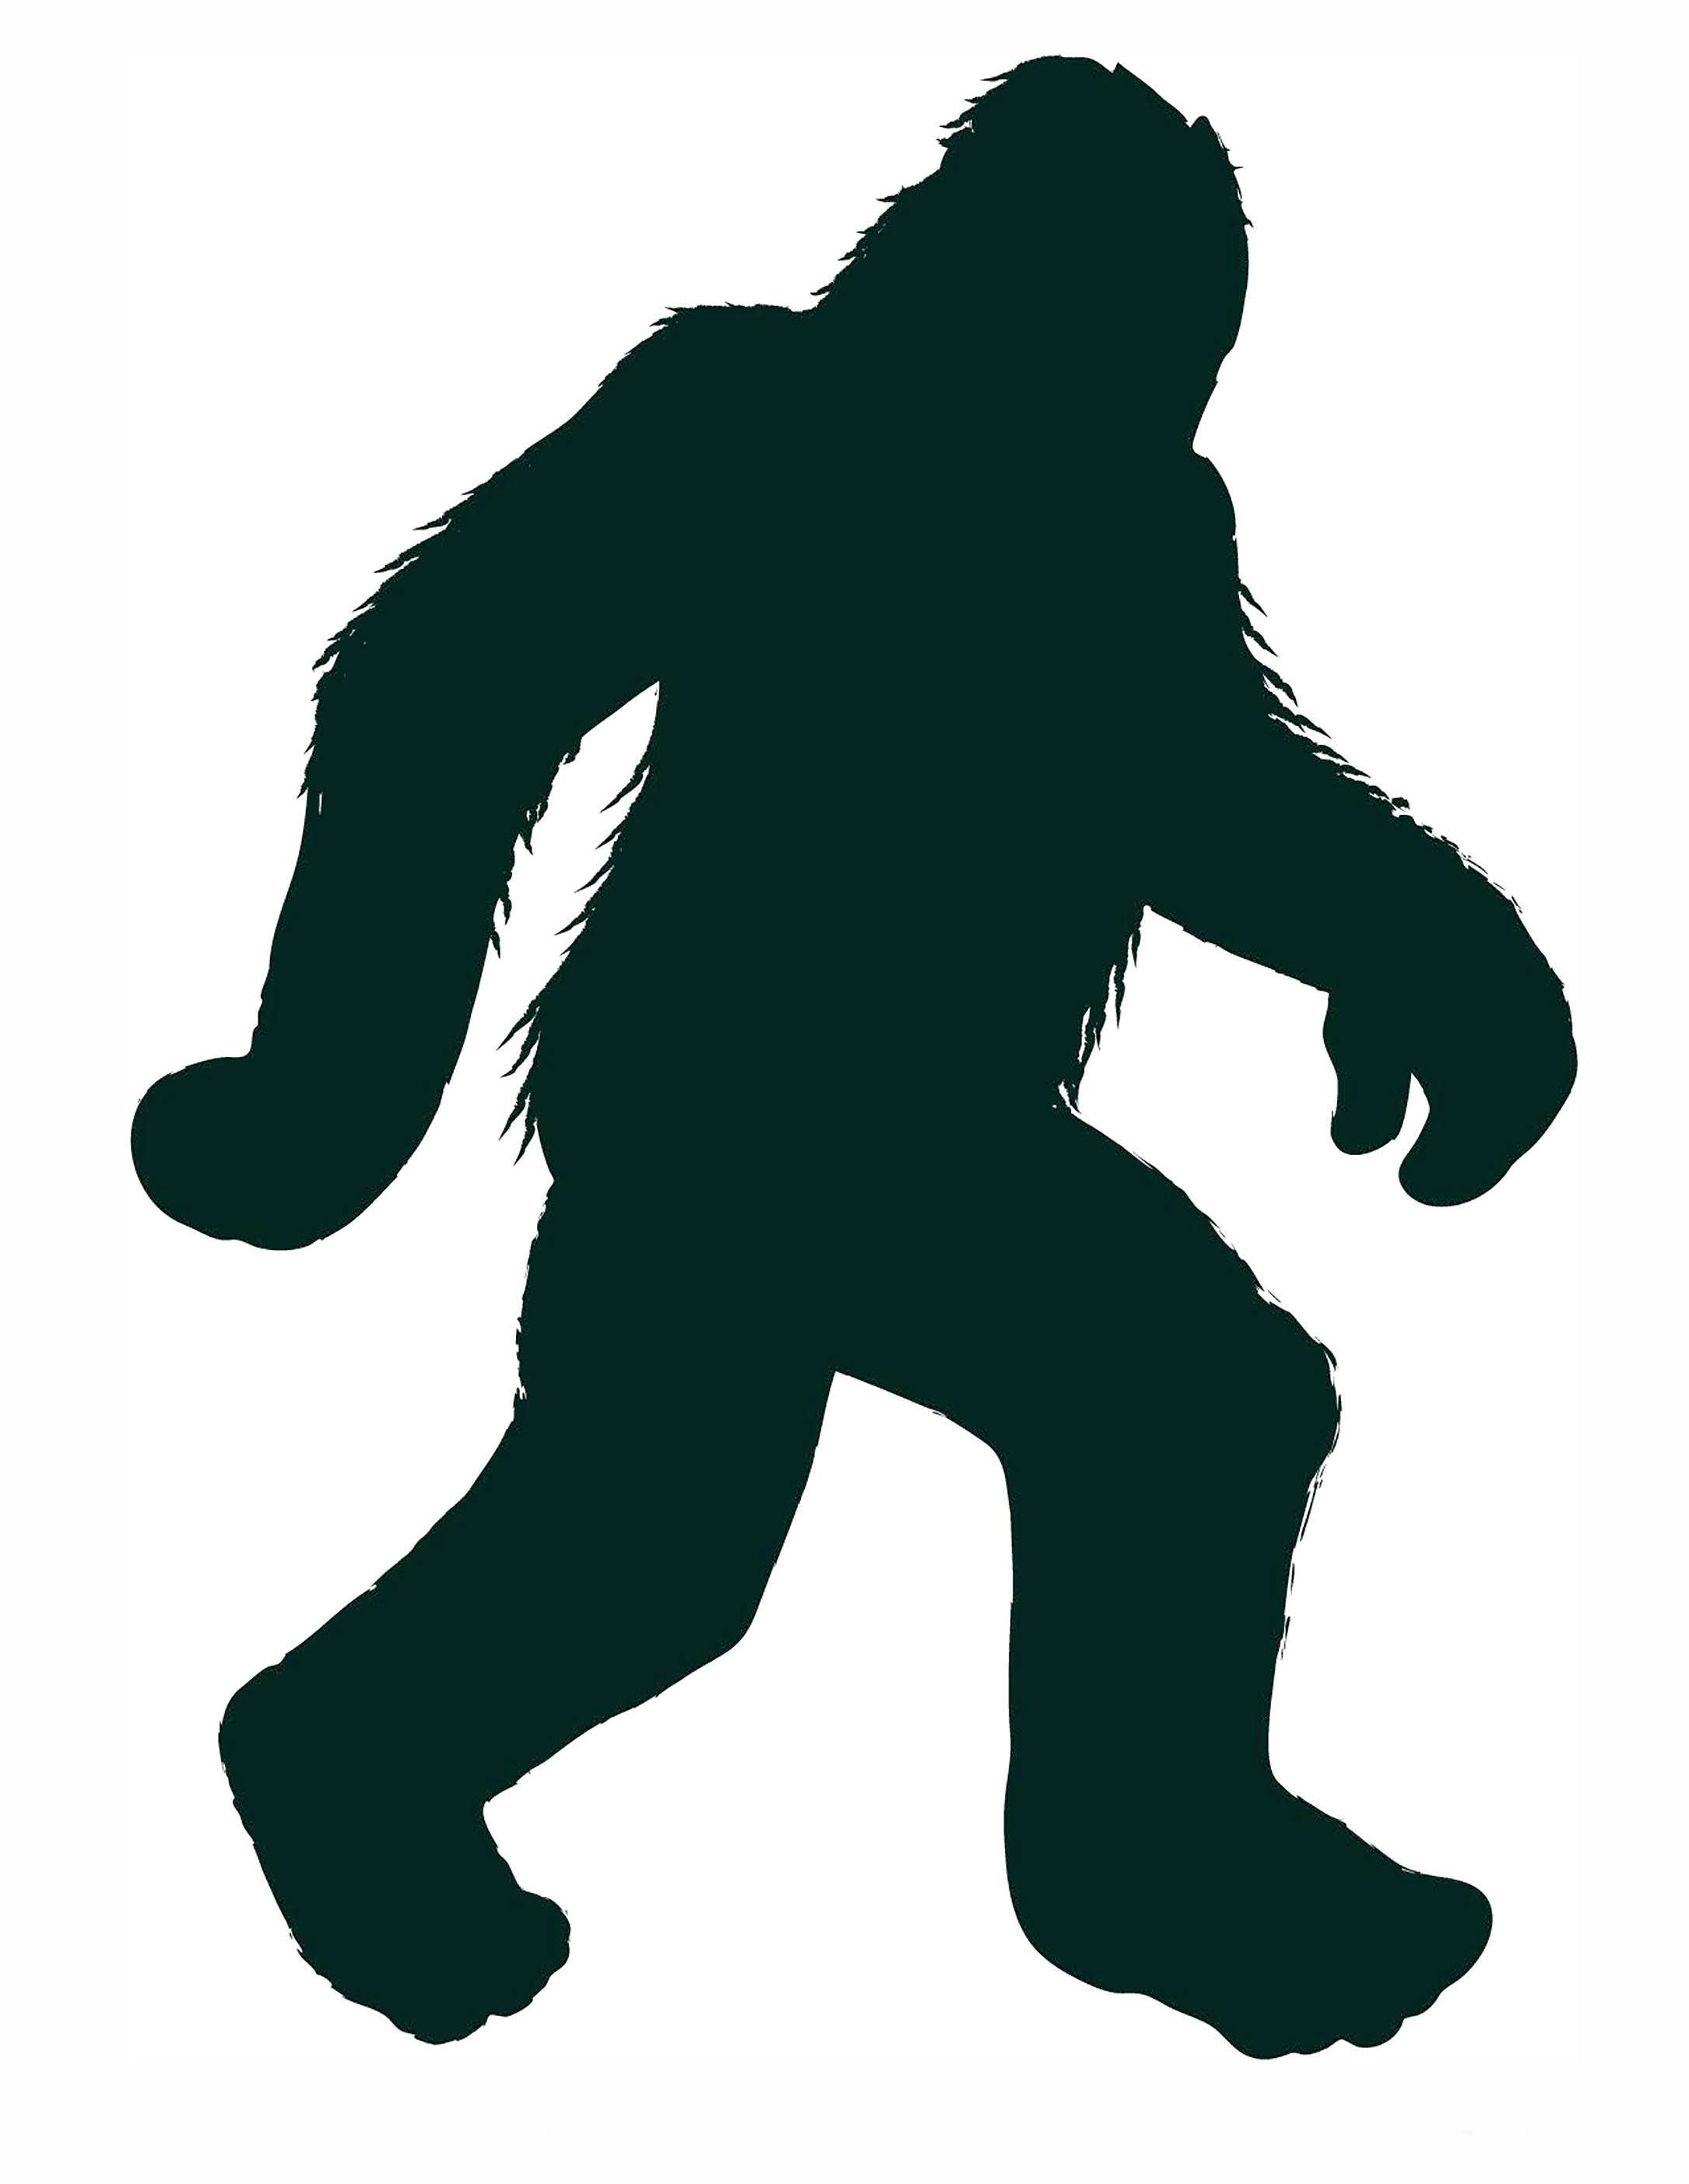 bigfoot outline - photo #8